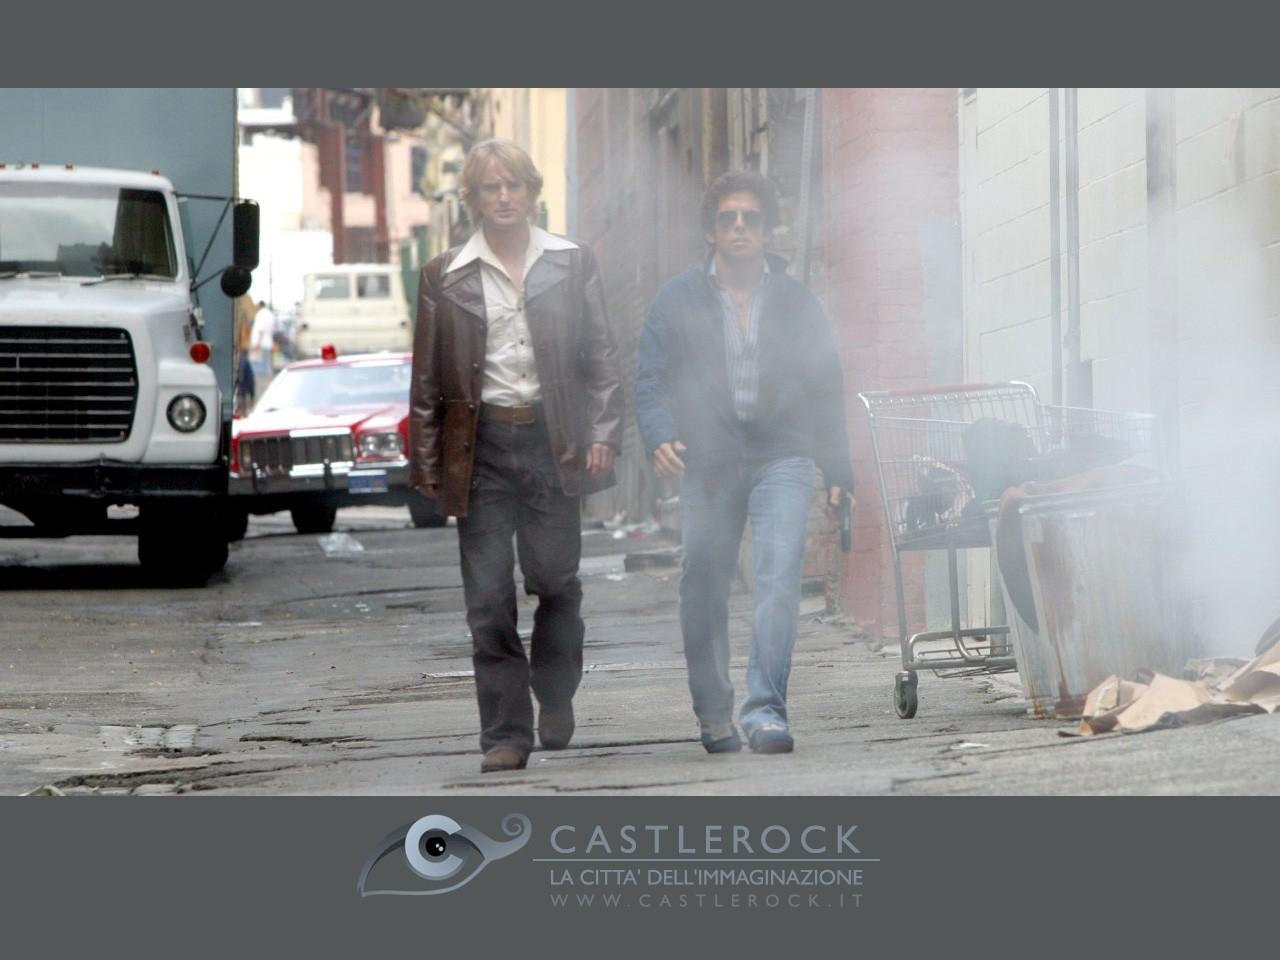 Wallpaper del film Starsky & Hutch